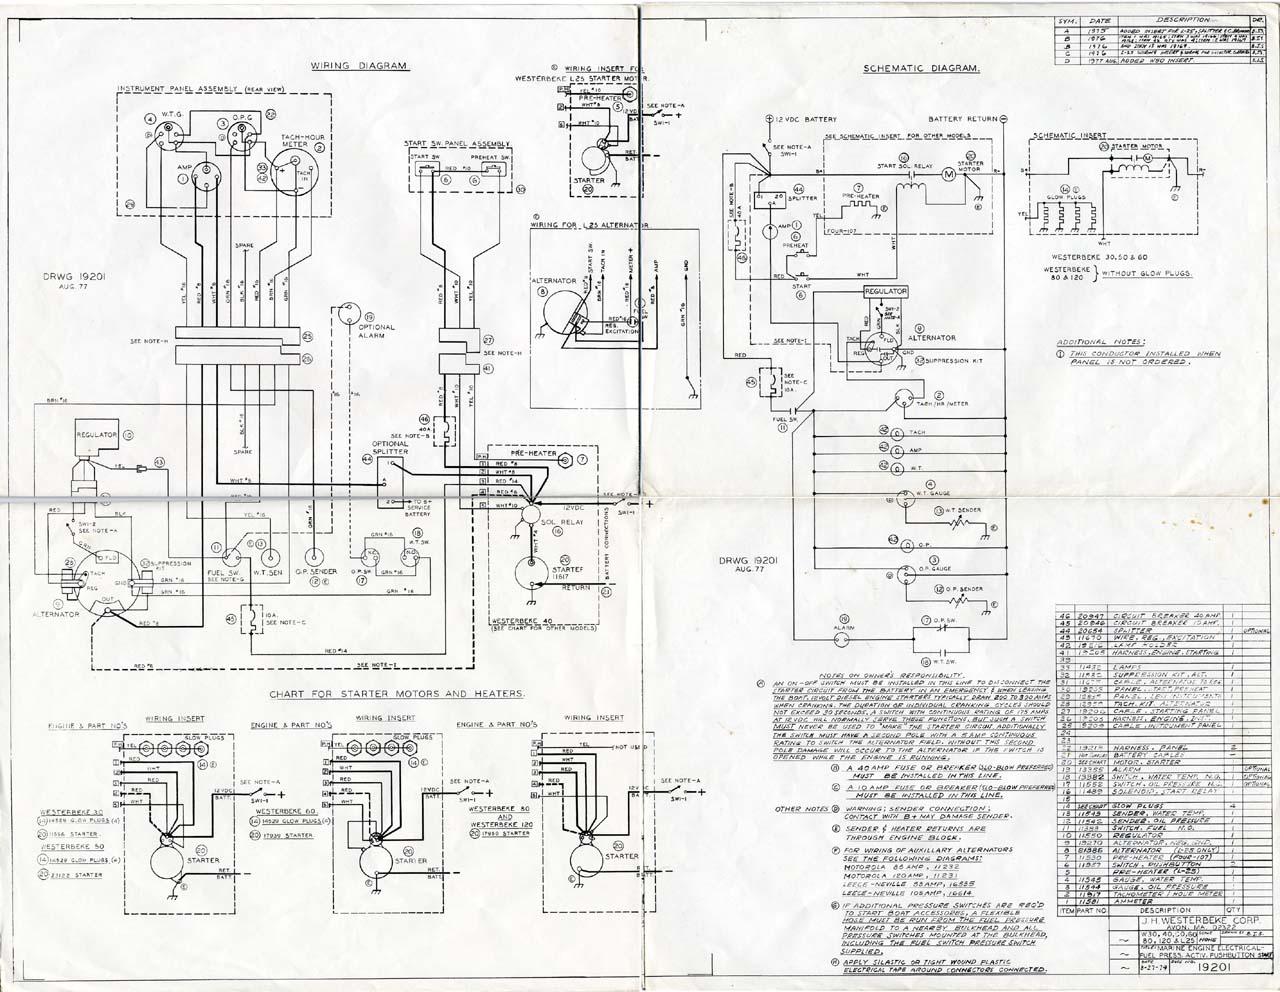 Pearson 424 Plans